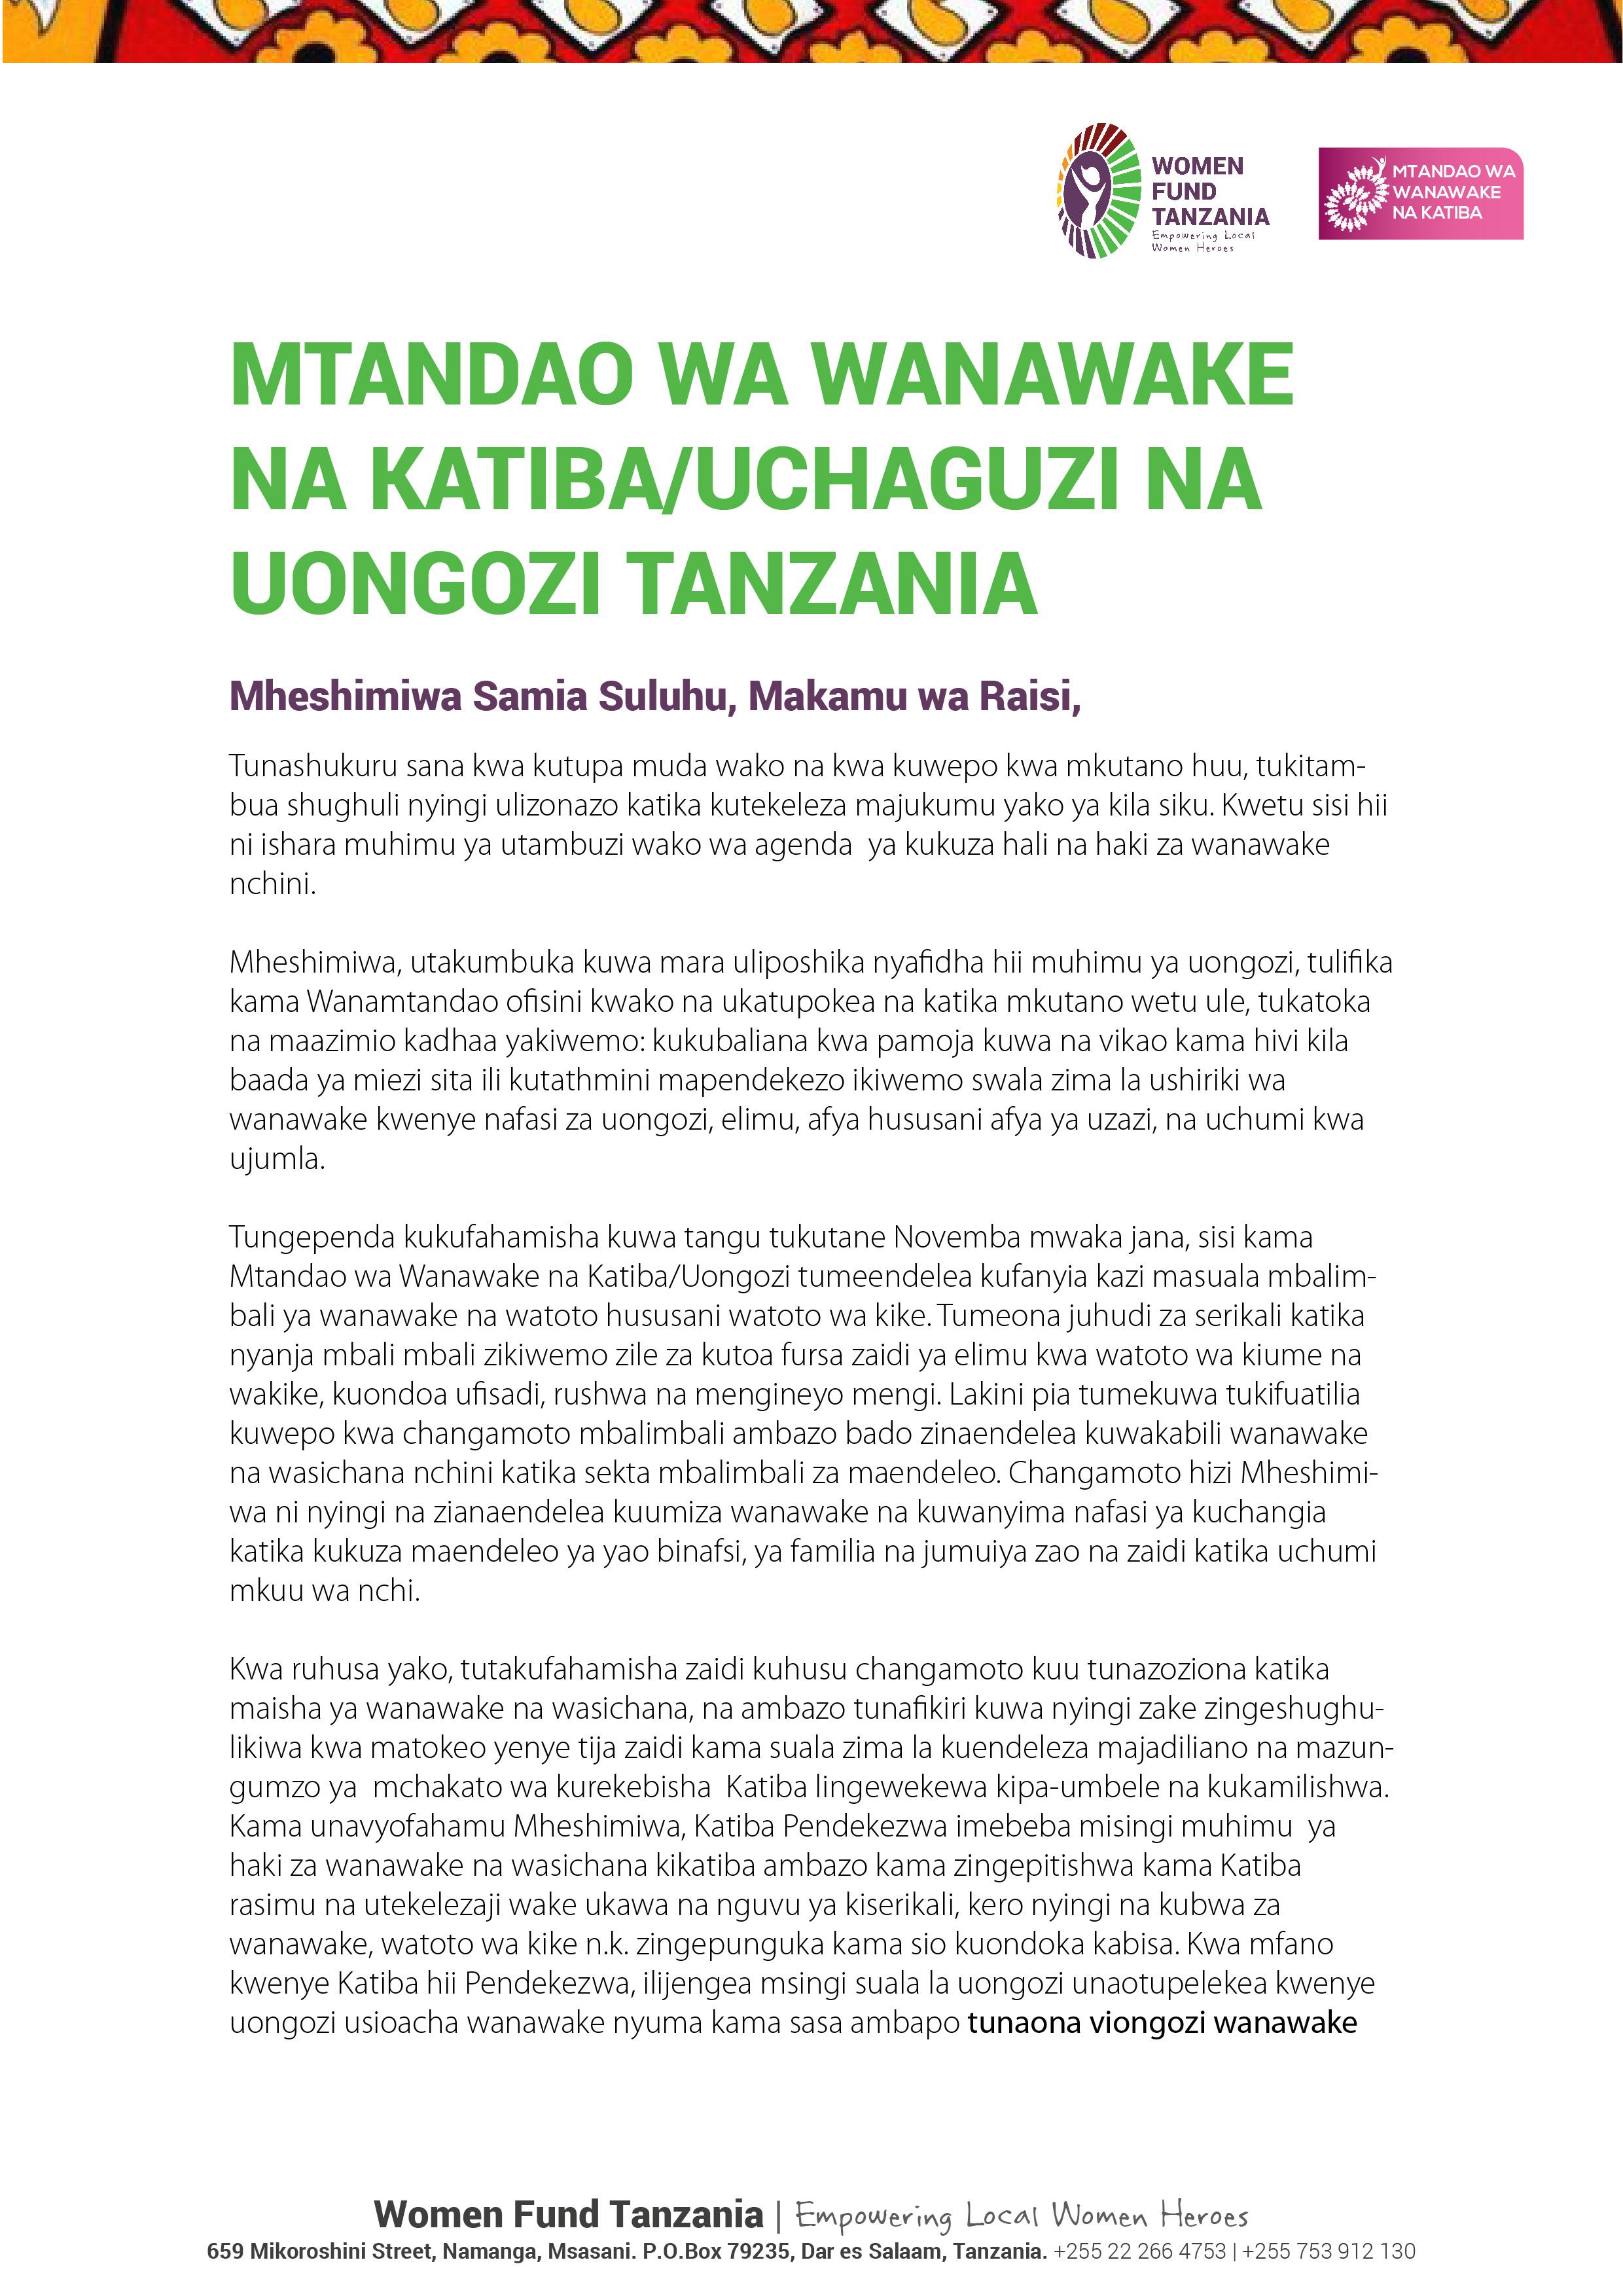 Wanawake na Katiba Taking Points-Meeting with Tanzanian Vice President Hon. Samia Suuhu-01